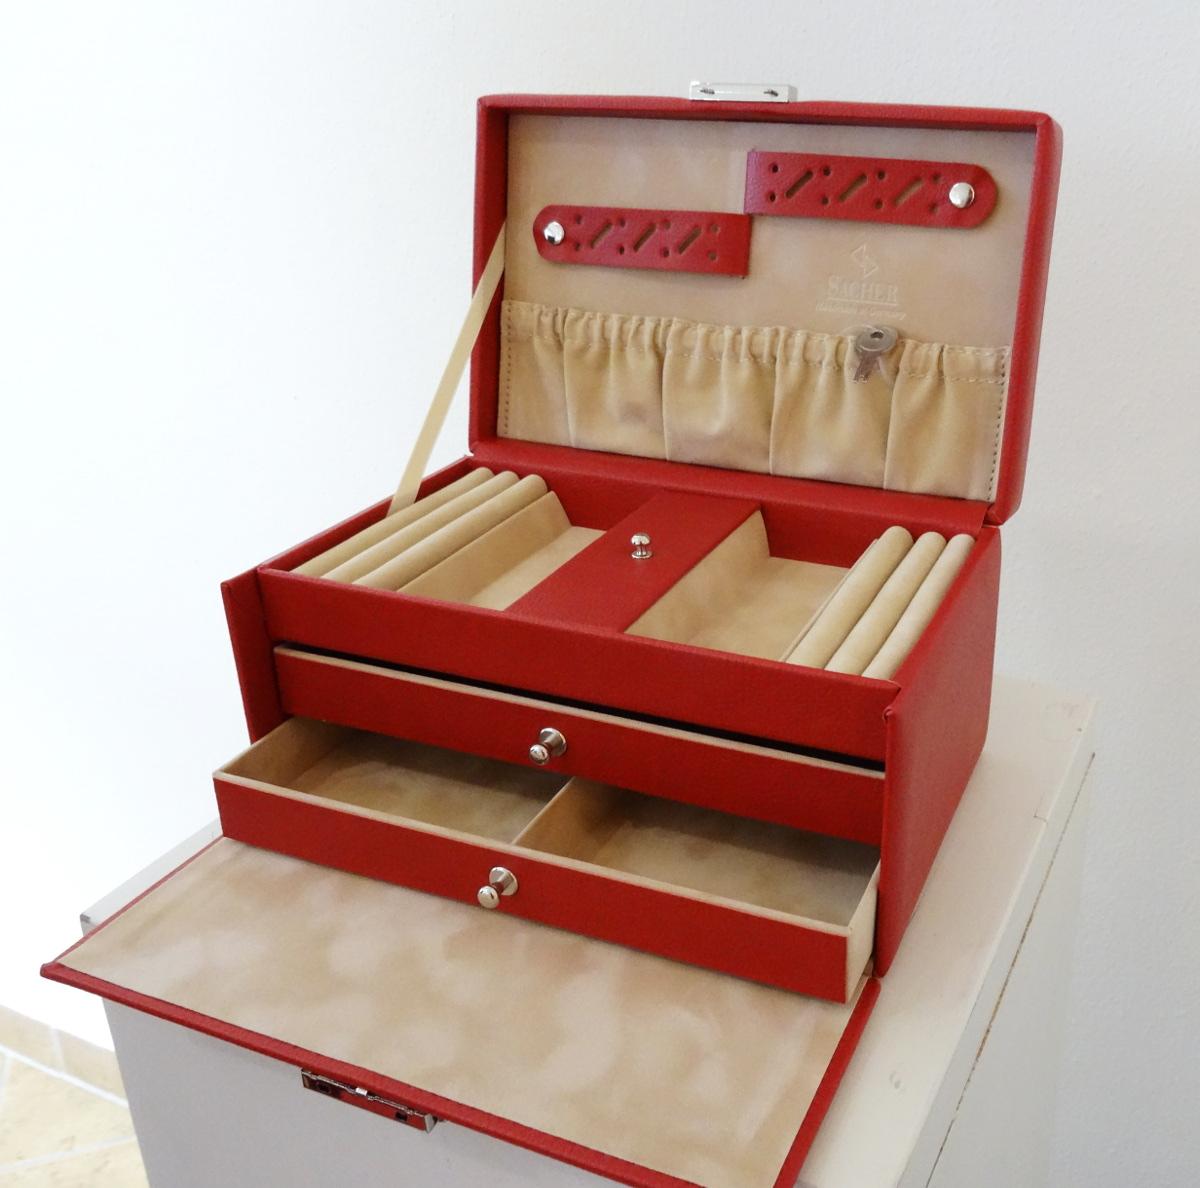 Schmuckkoffer Kunstleder rot, aufgeklappt, Modell Eva, Firma Sacher, made in Germany